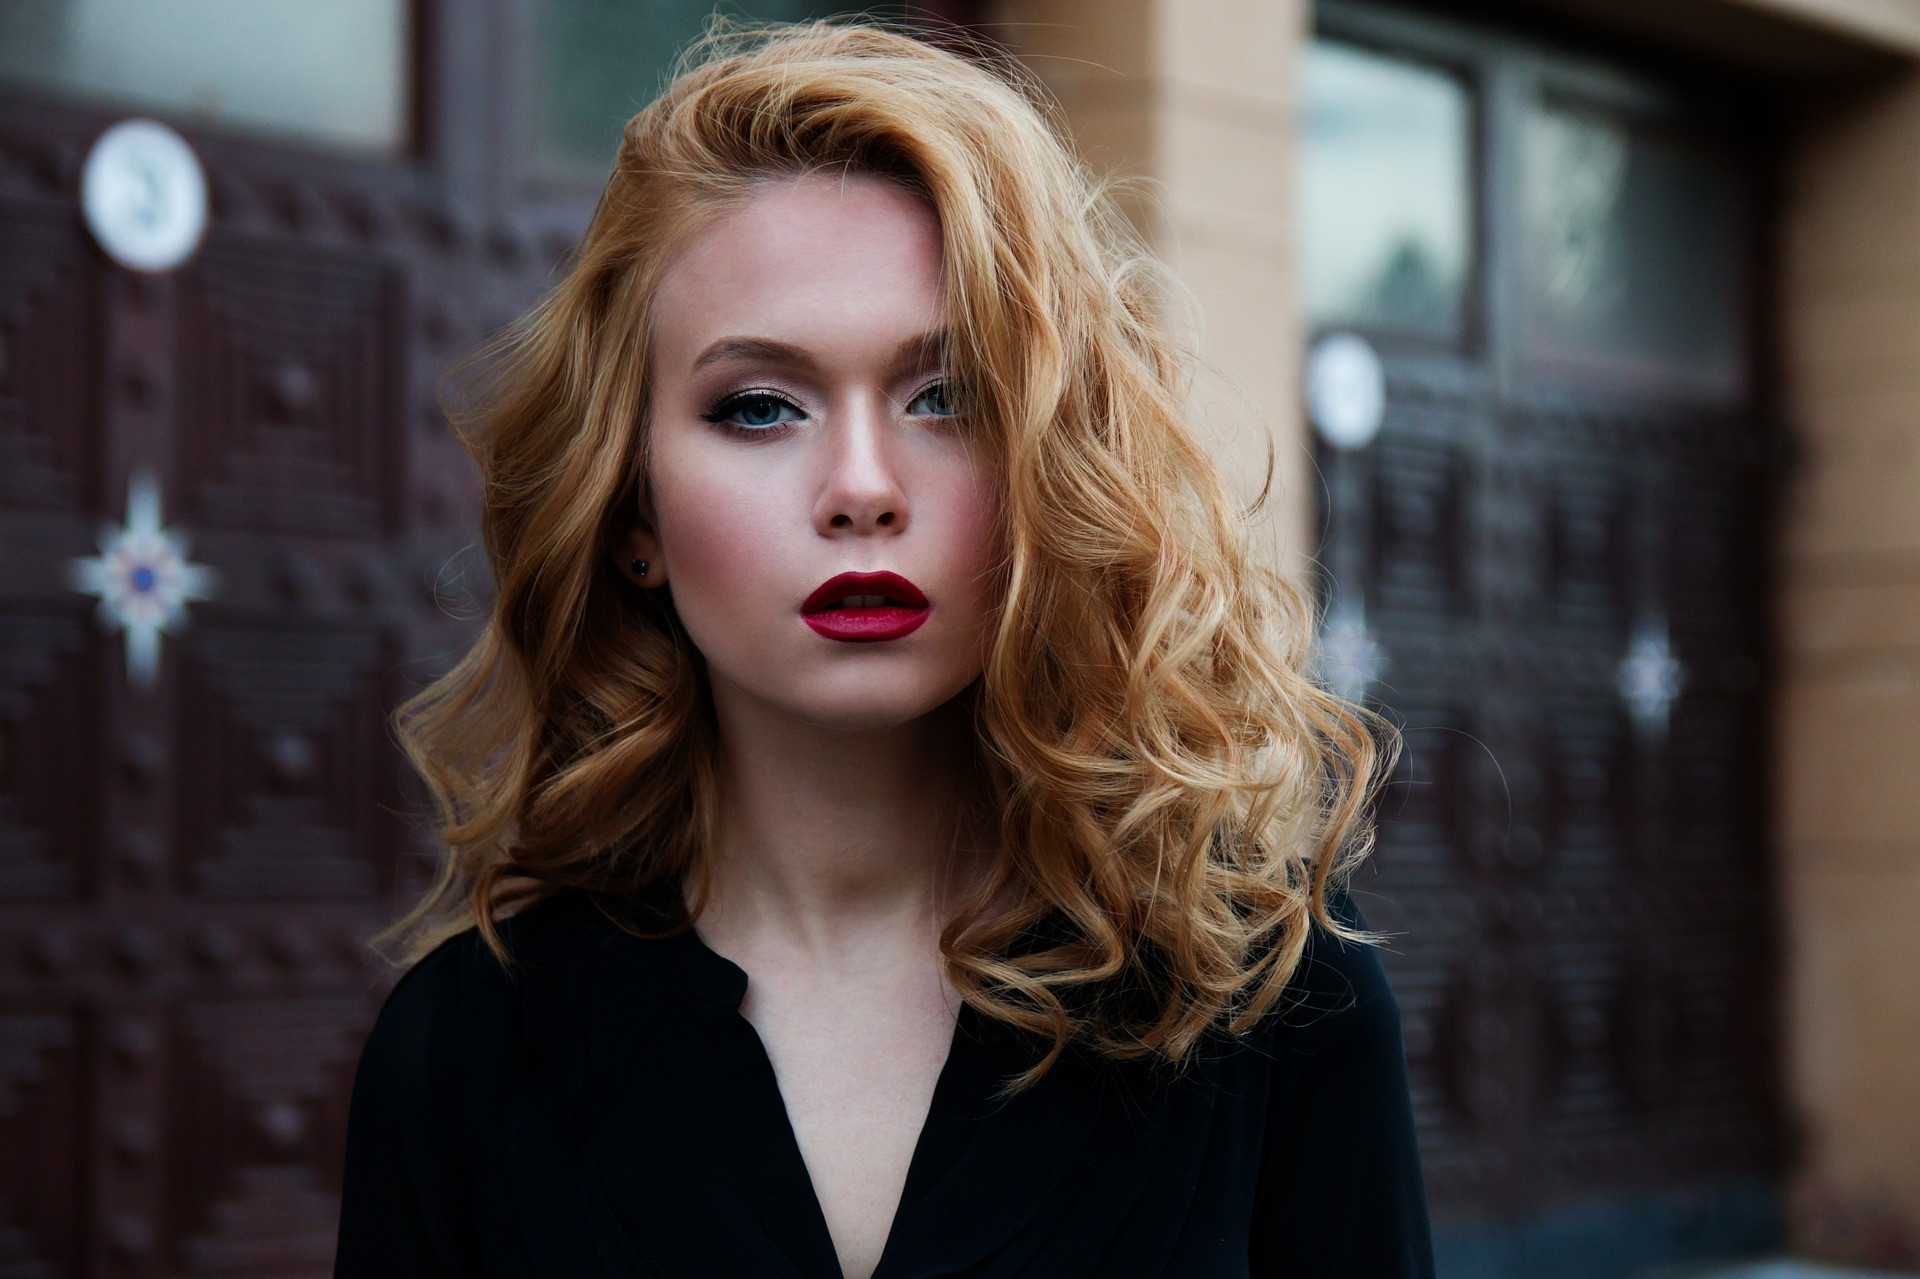 Catat, Ini Lho 3 Tipe Wanita yang Tidak Disukai Pria - JPNN.com